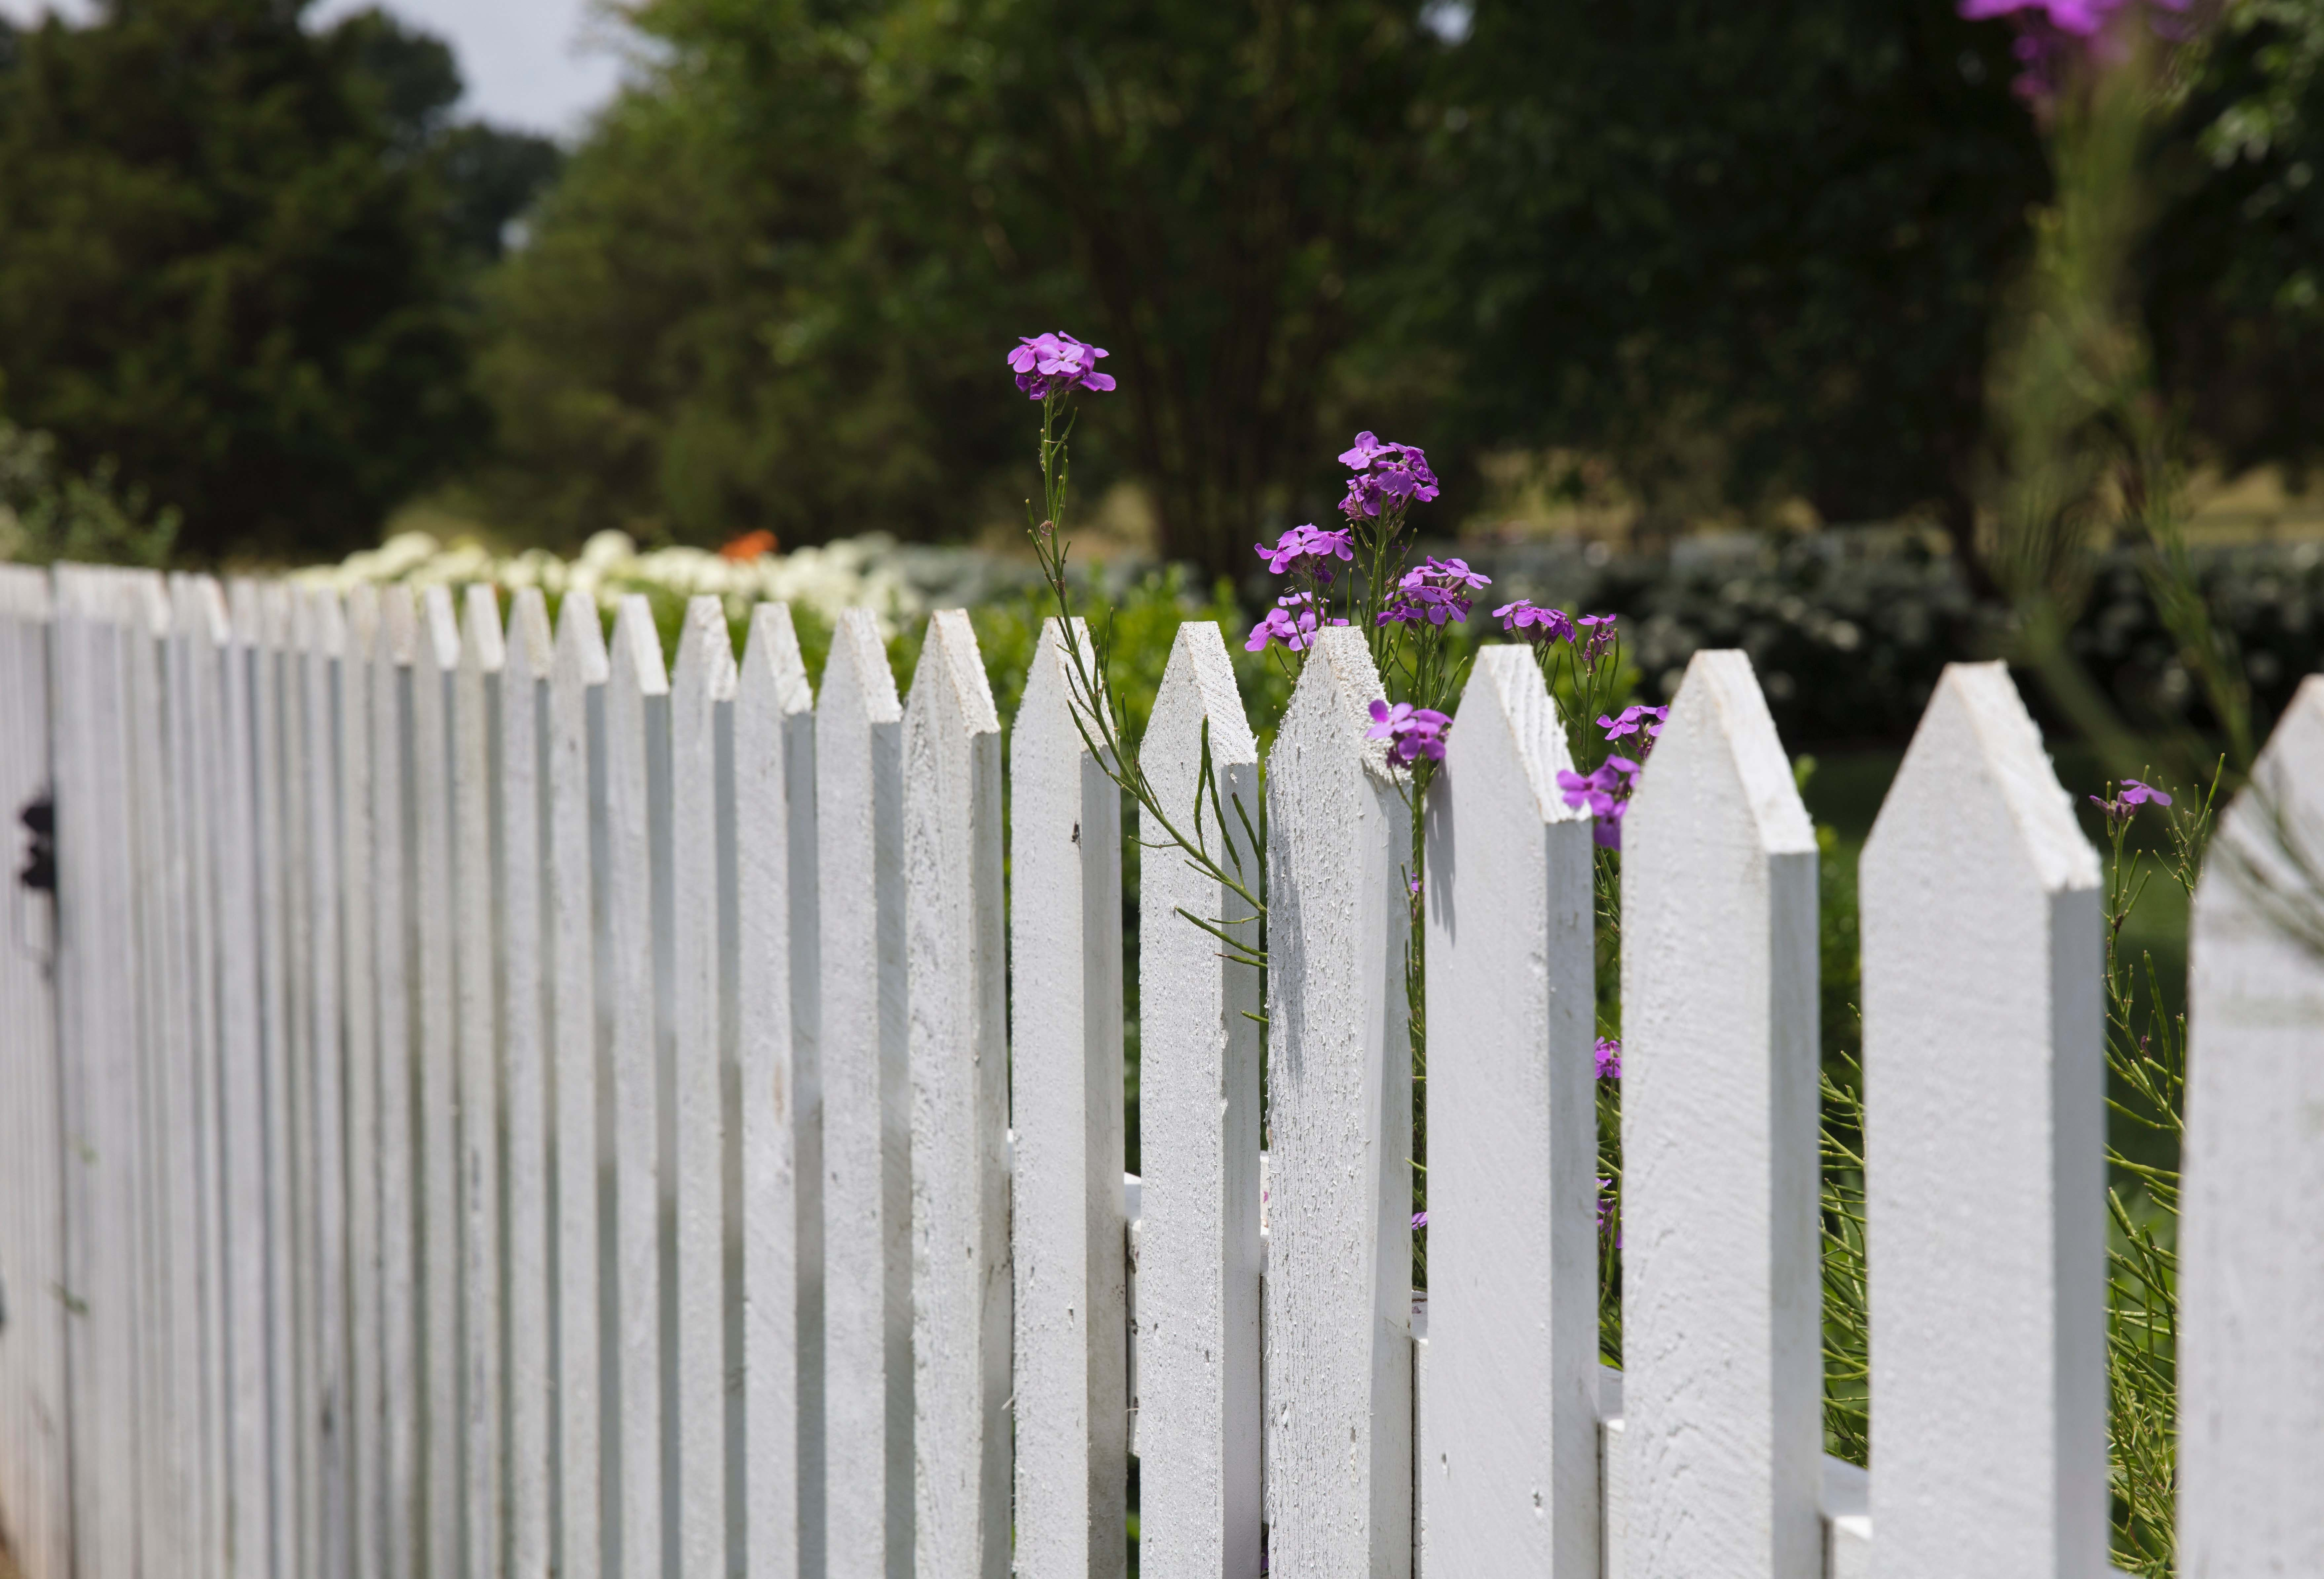 Fence Installation Guide: Plan, Preparation, Installation